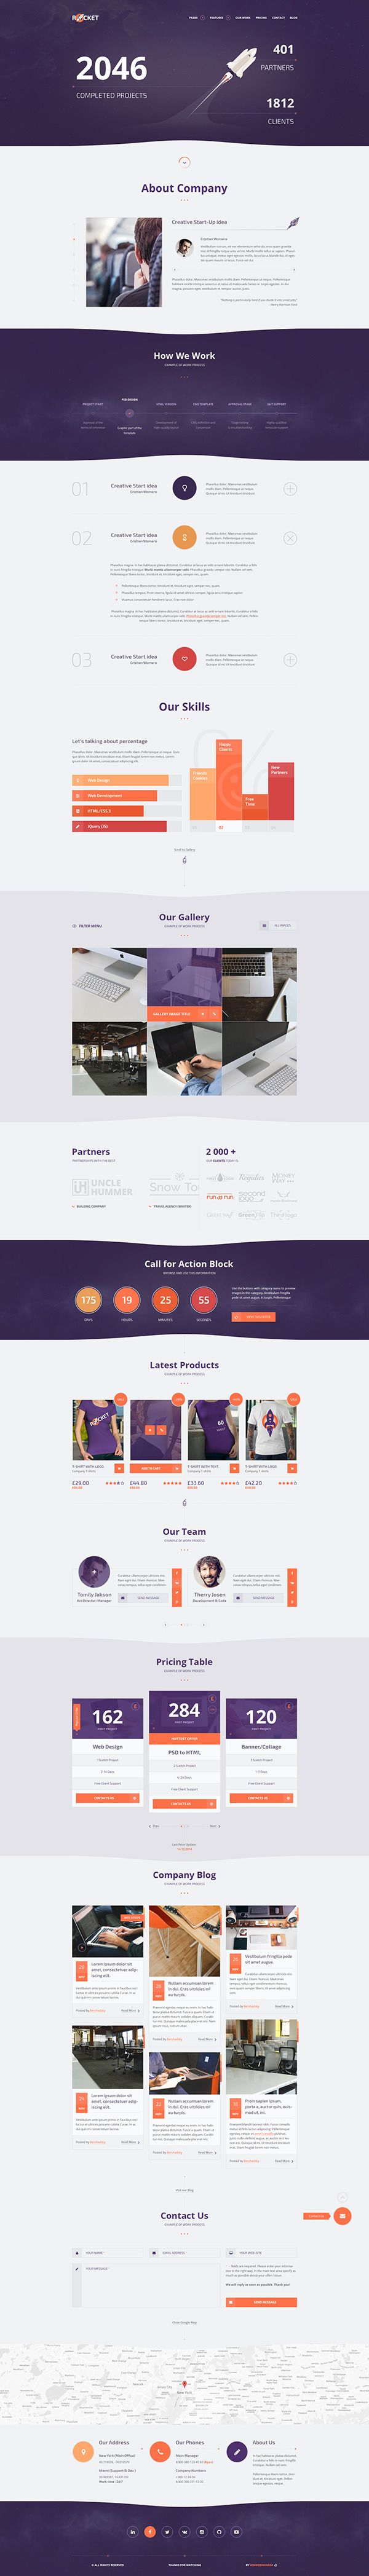 Rocket - Creative Multipurpose Template, UI concept design by Web Create.Me on Behance.